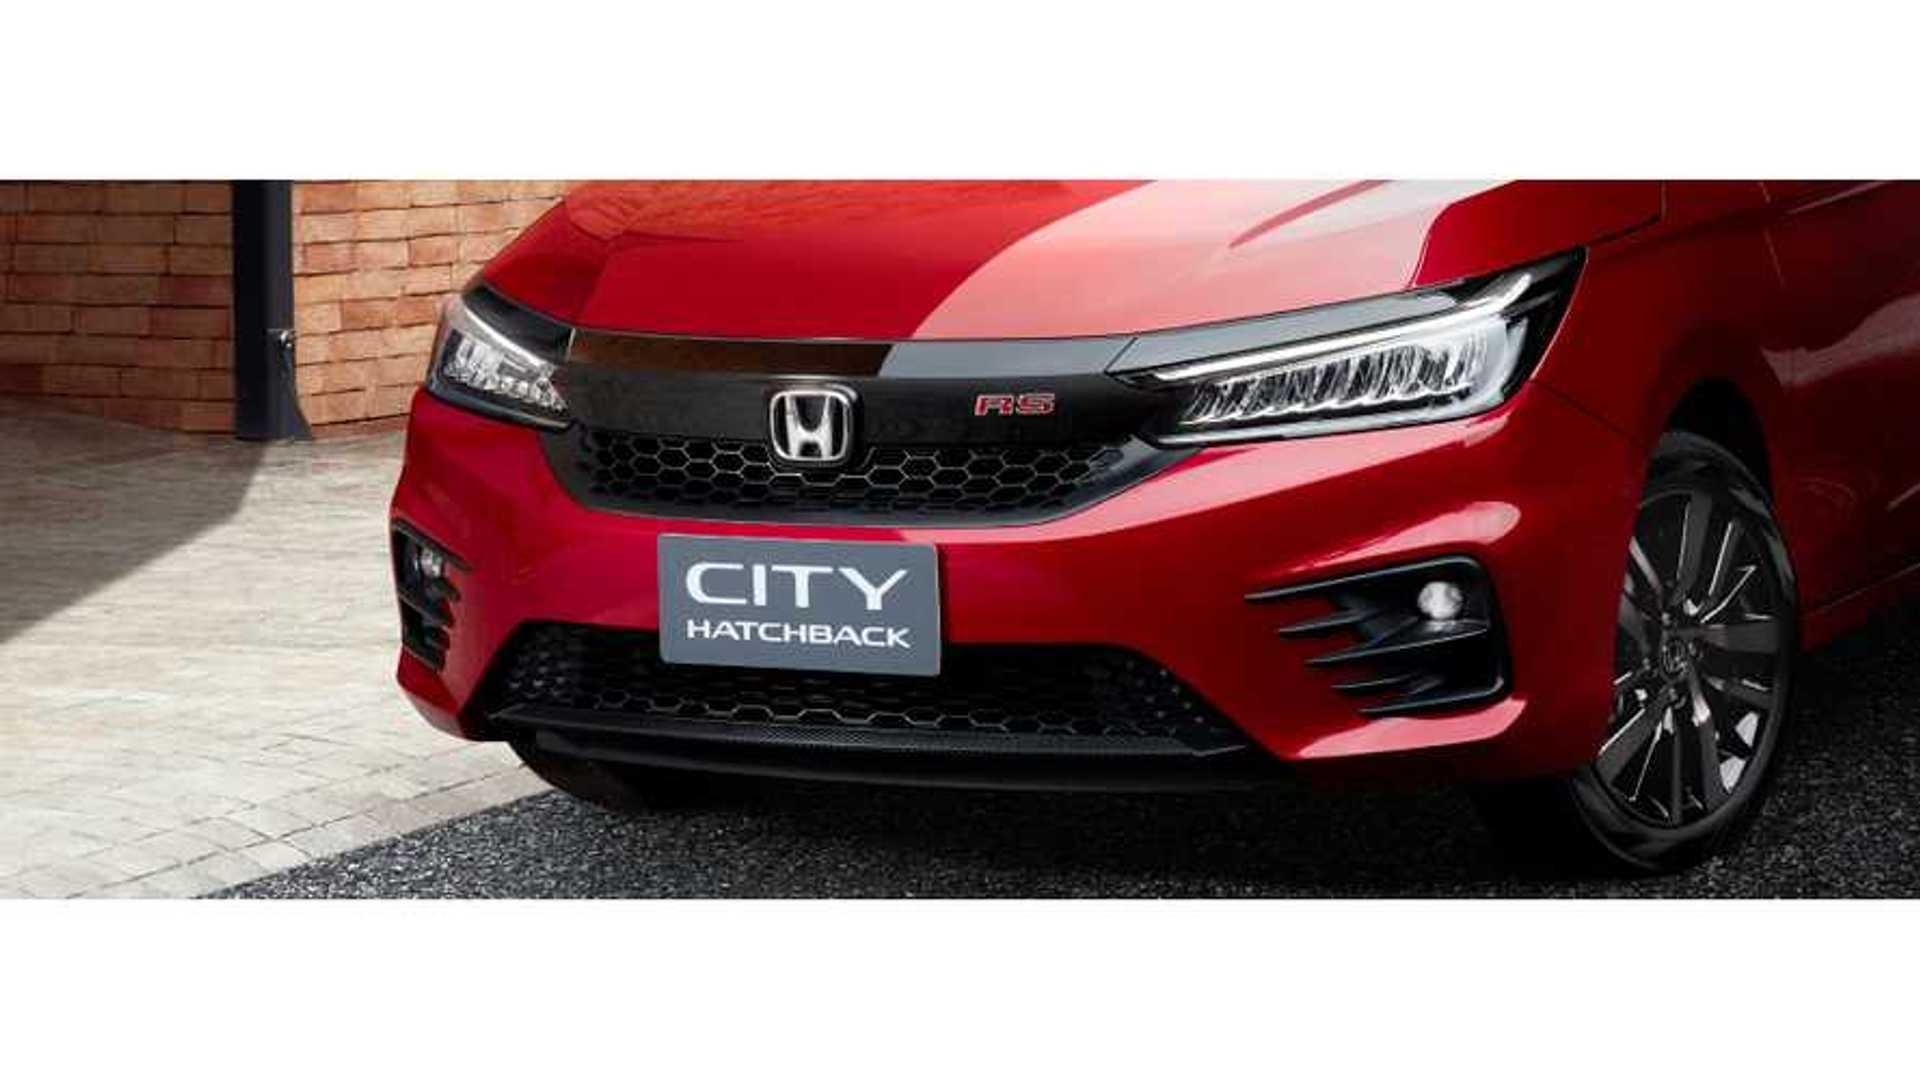 2021-honda-city-hatchback.jpg